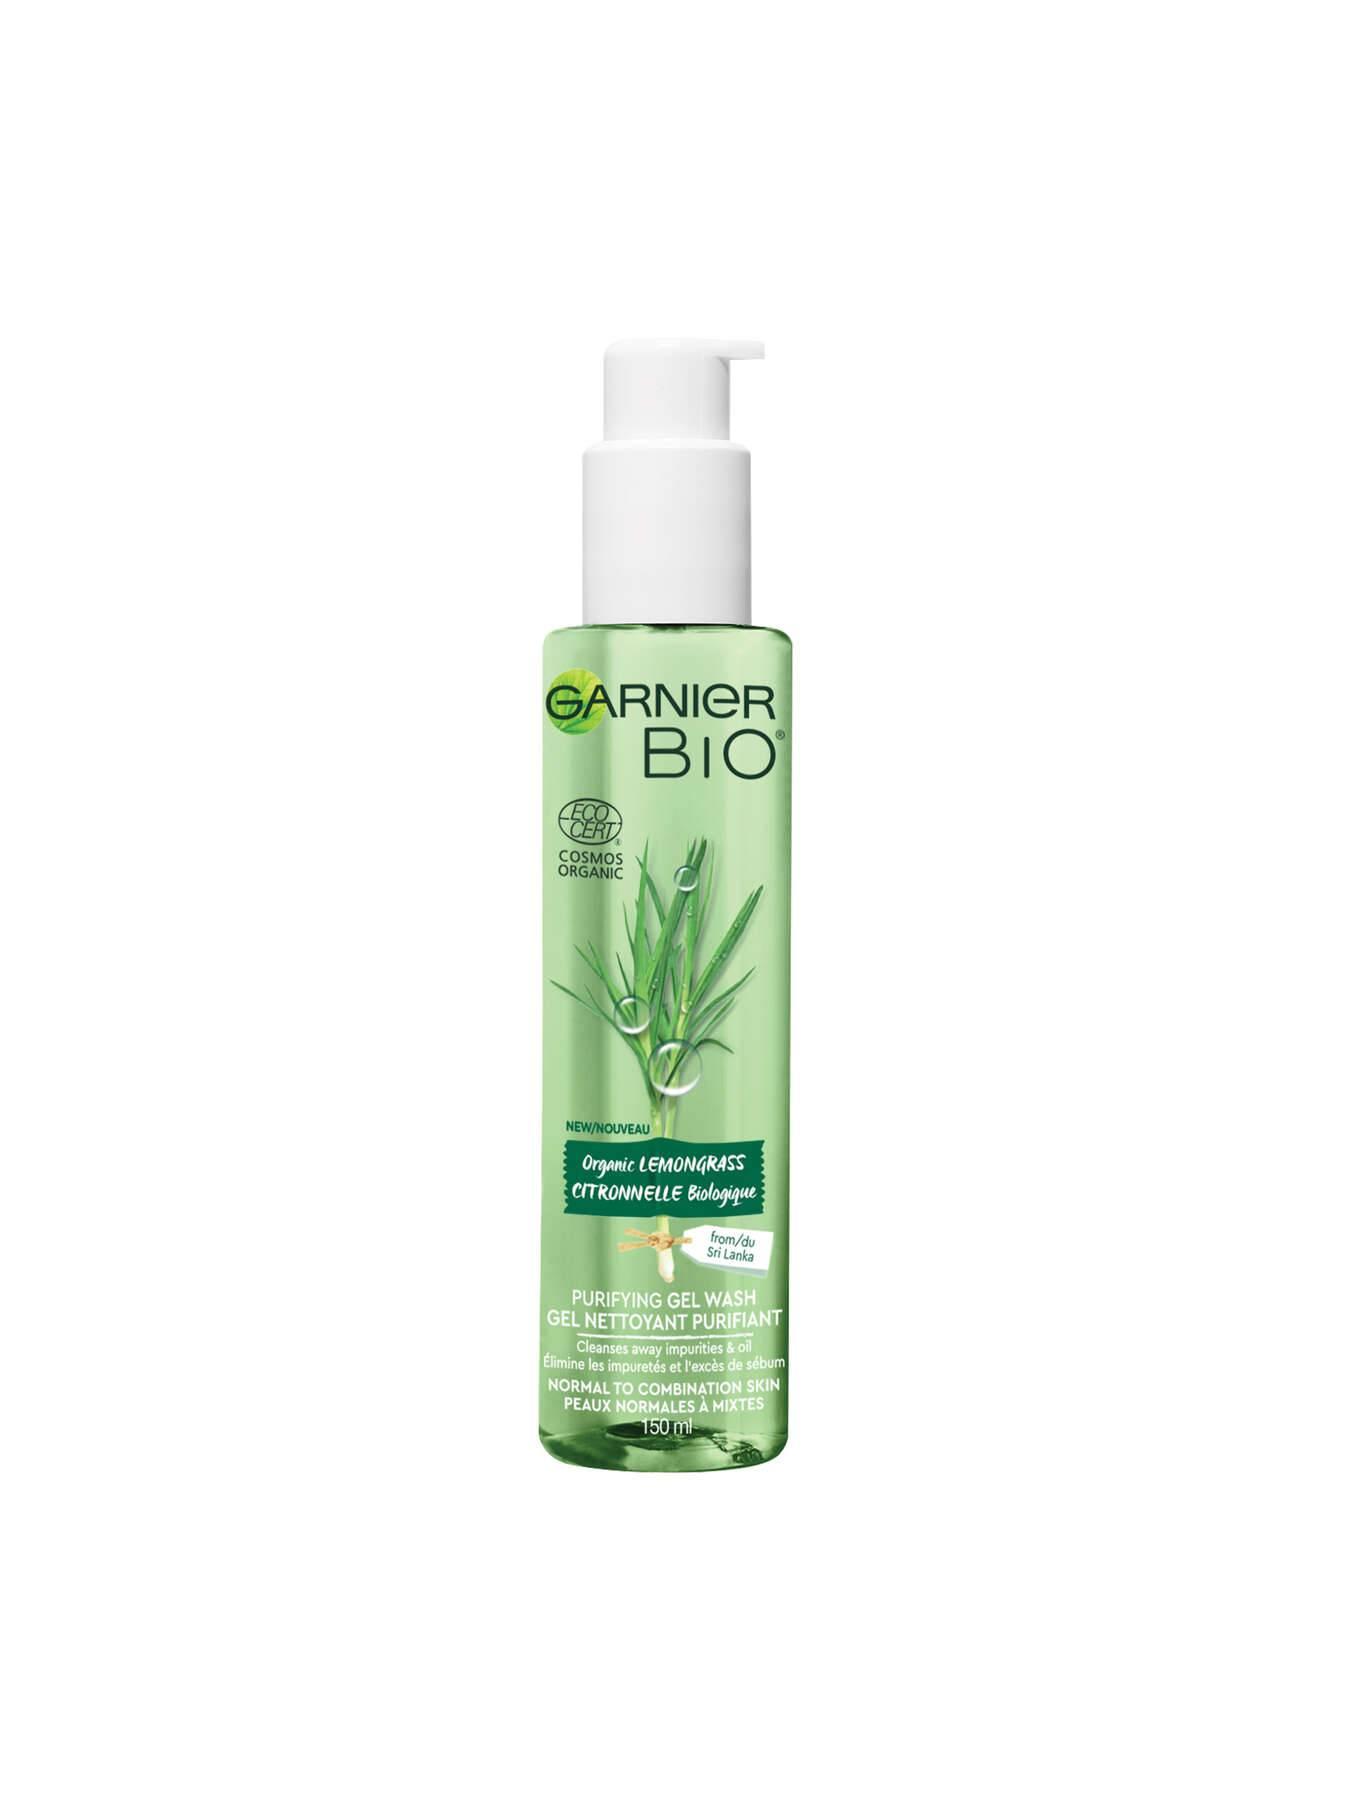 Garnier BIO - Organic Lemongrass Gel Wash For Normal To Combination Skin